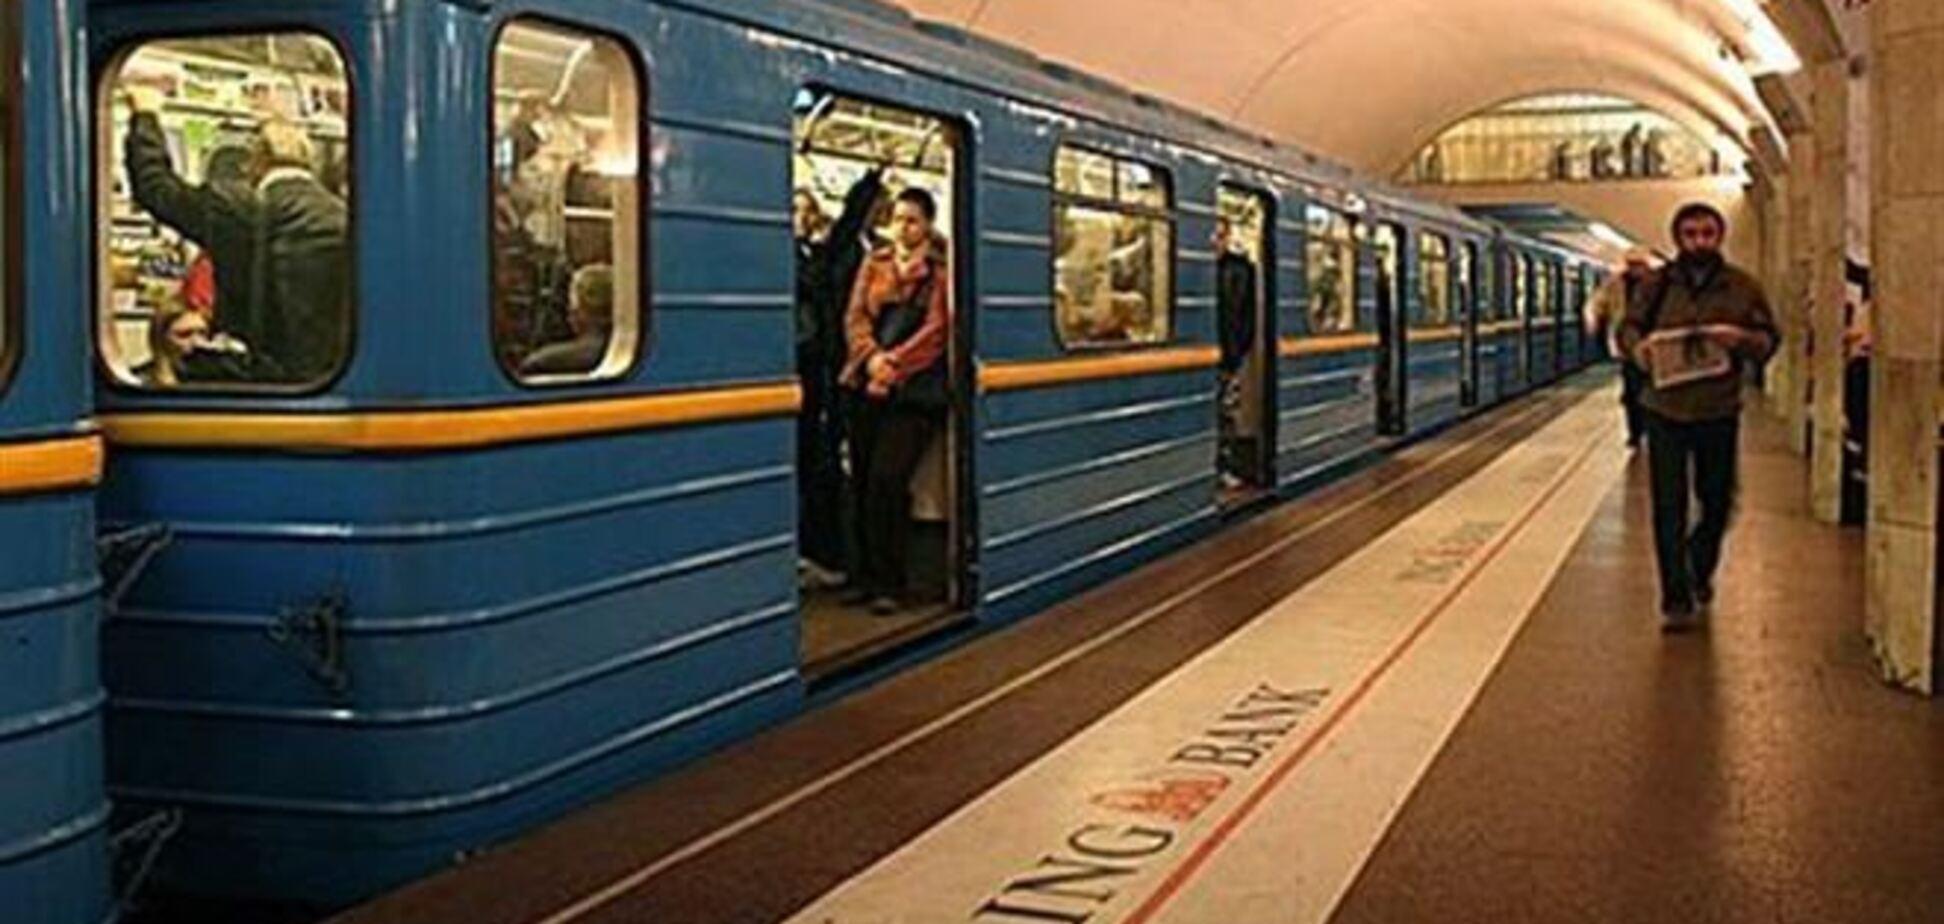 Станции метро 'Крещатик' и 'Майдан Незалежности' возобновили работу